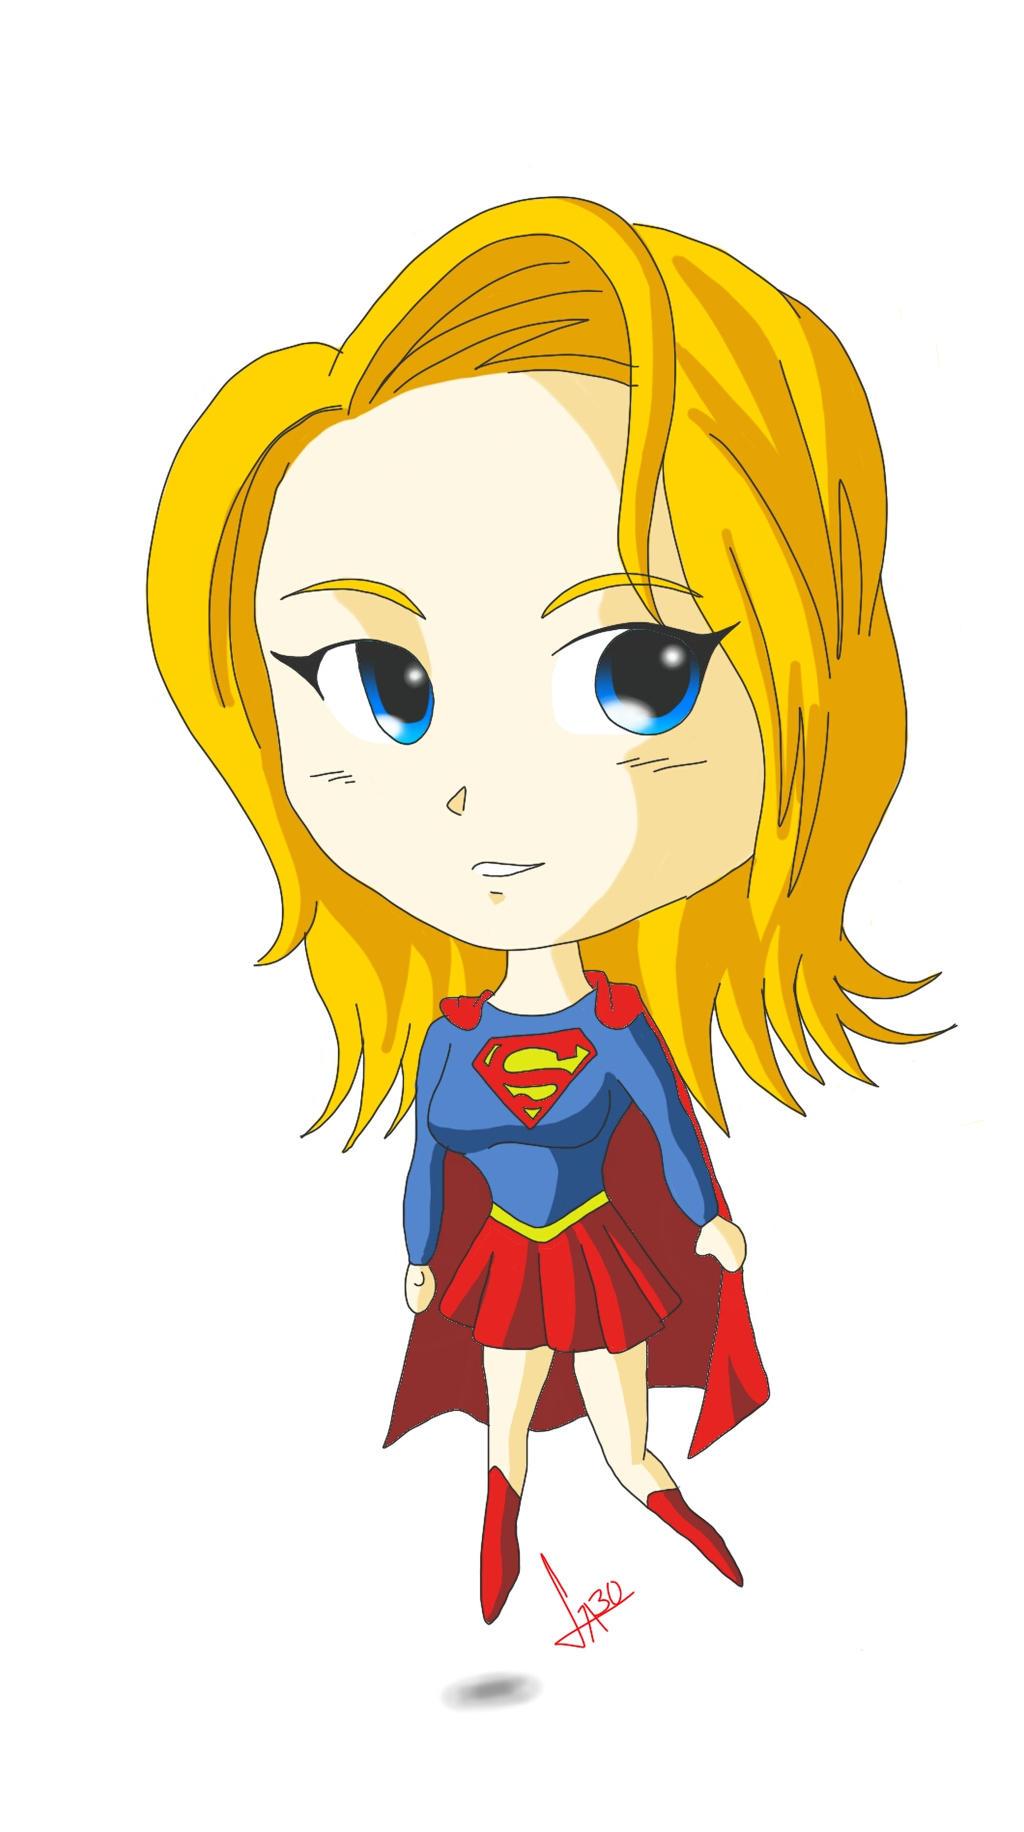 super girl chibi style by GABOND12 on DeviantArt